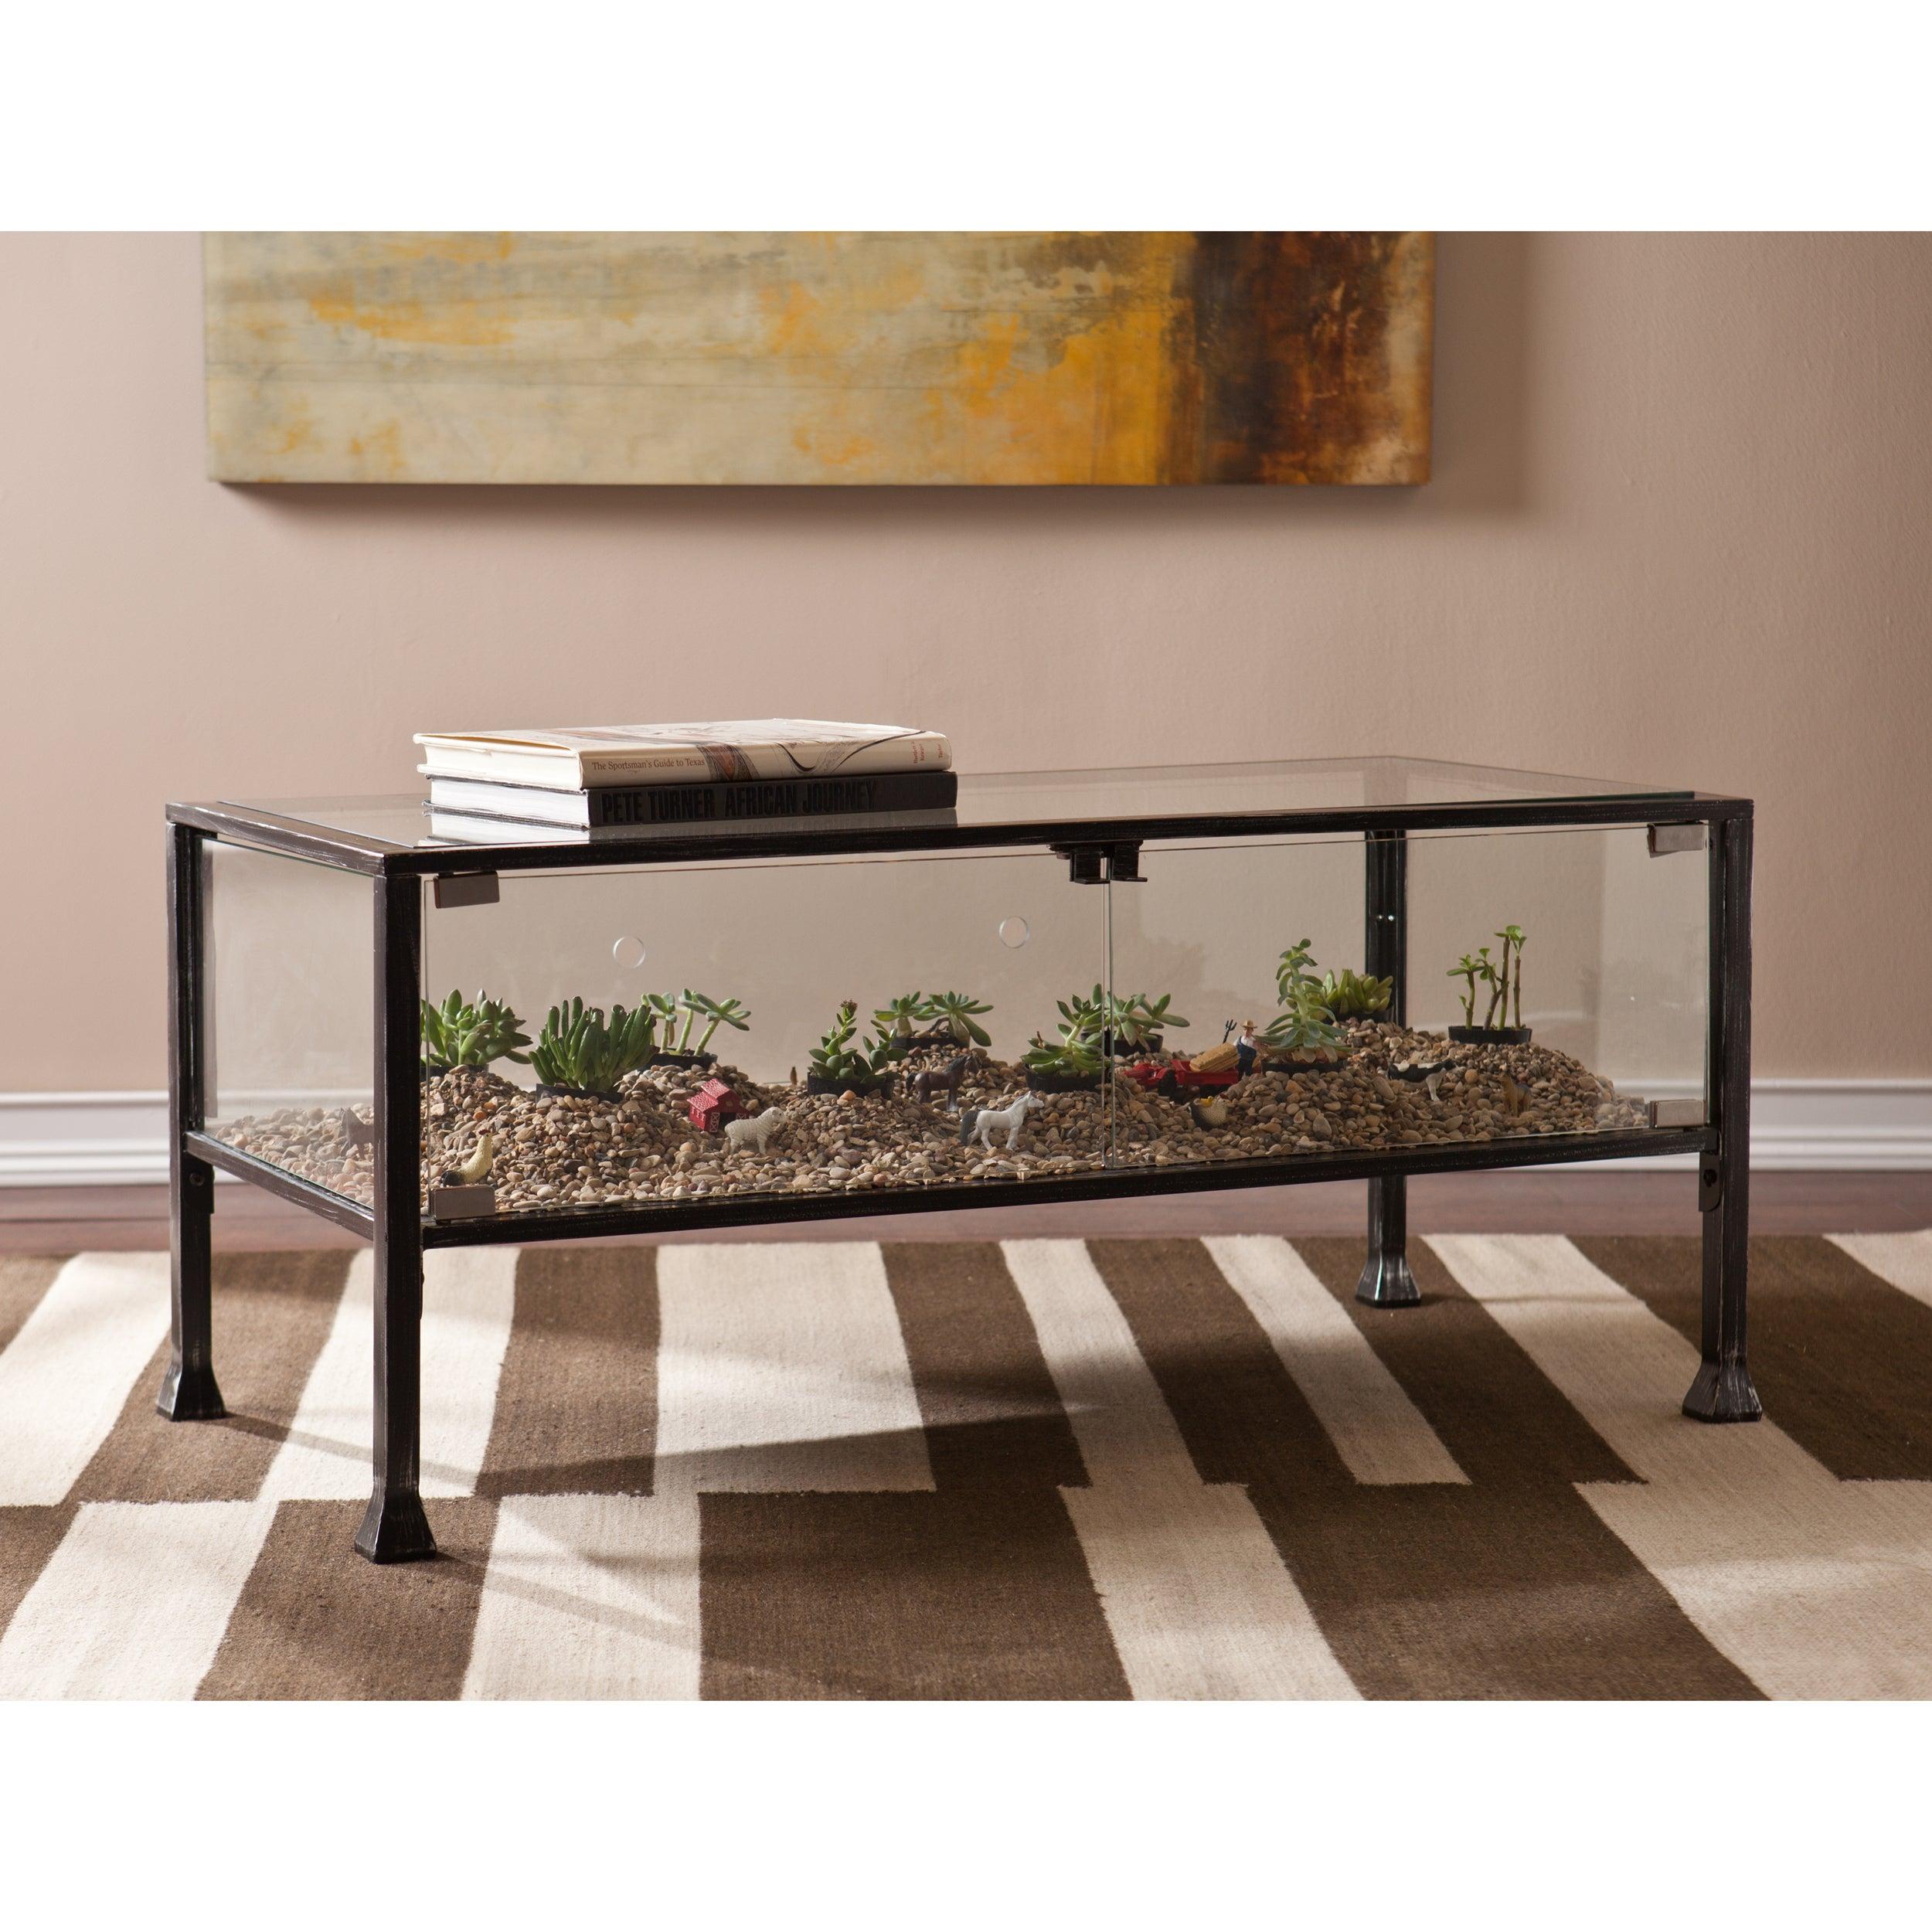 Shop Black Friday Deals On Carbon Loft Glenn Display Terrarium Coffee Cocktail Table Overstock 22751167